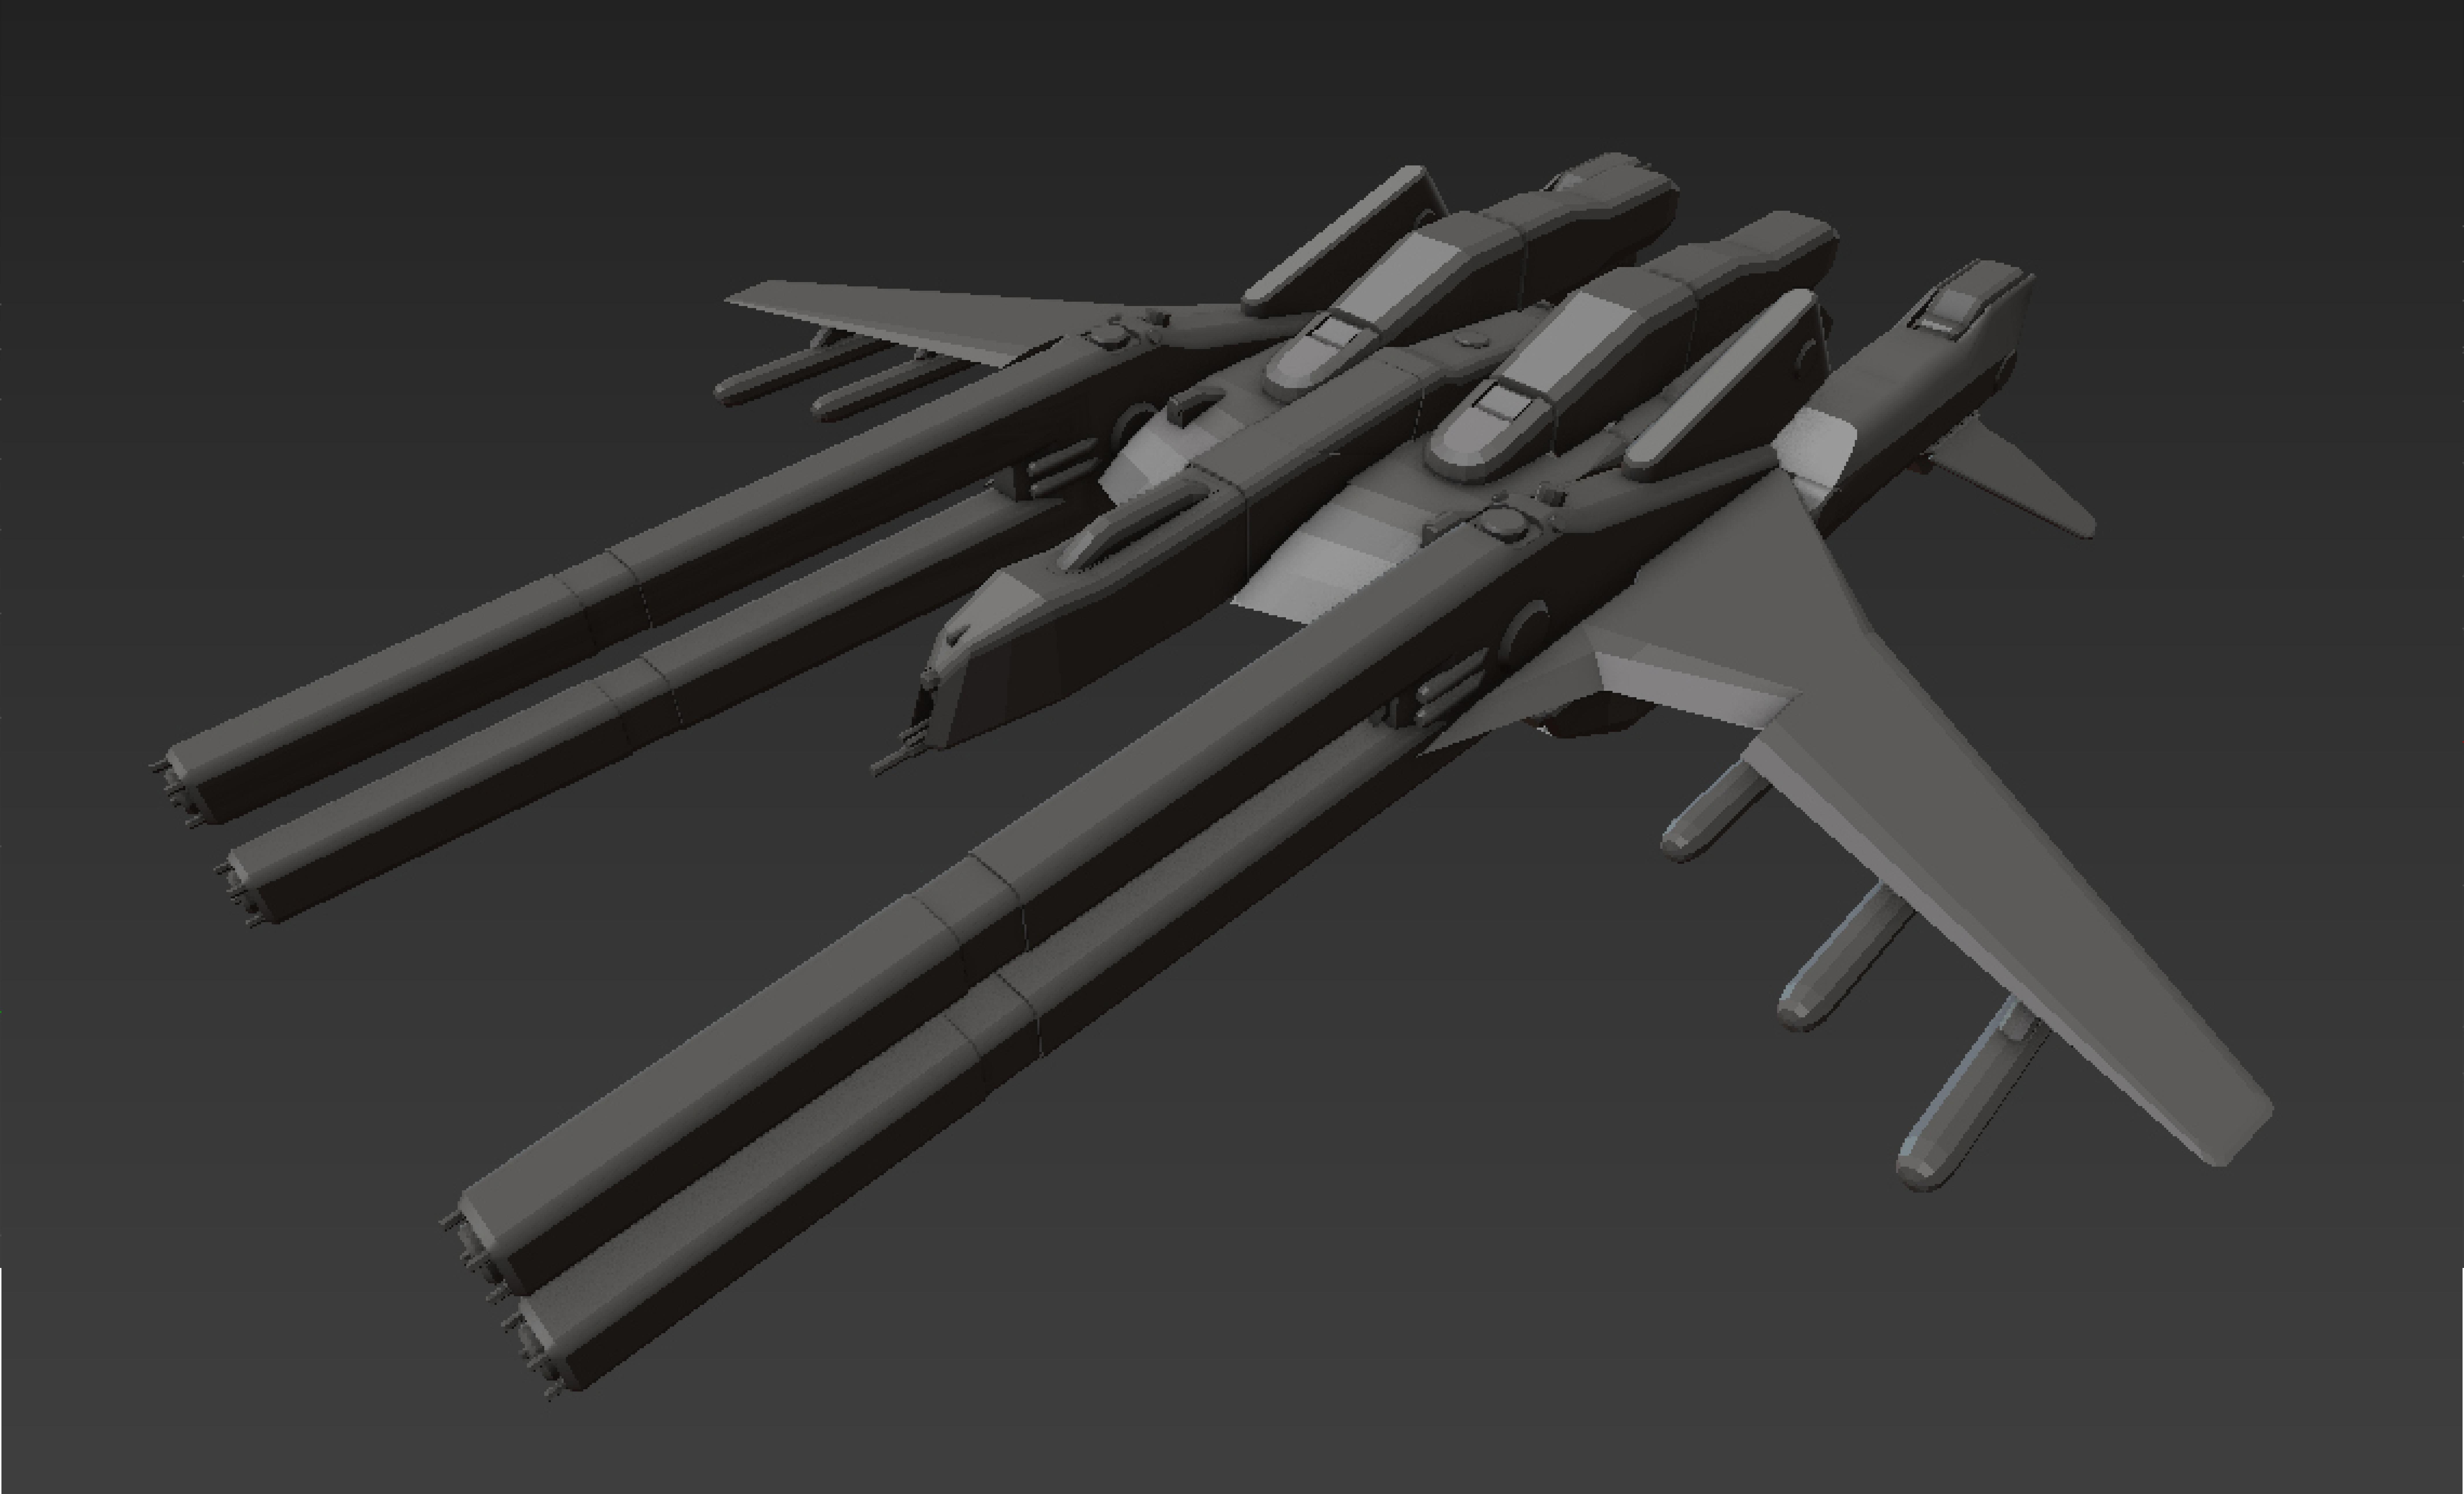 XM03 3D Model Workflow tutorial - Mod DB